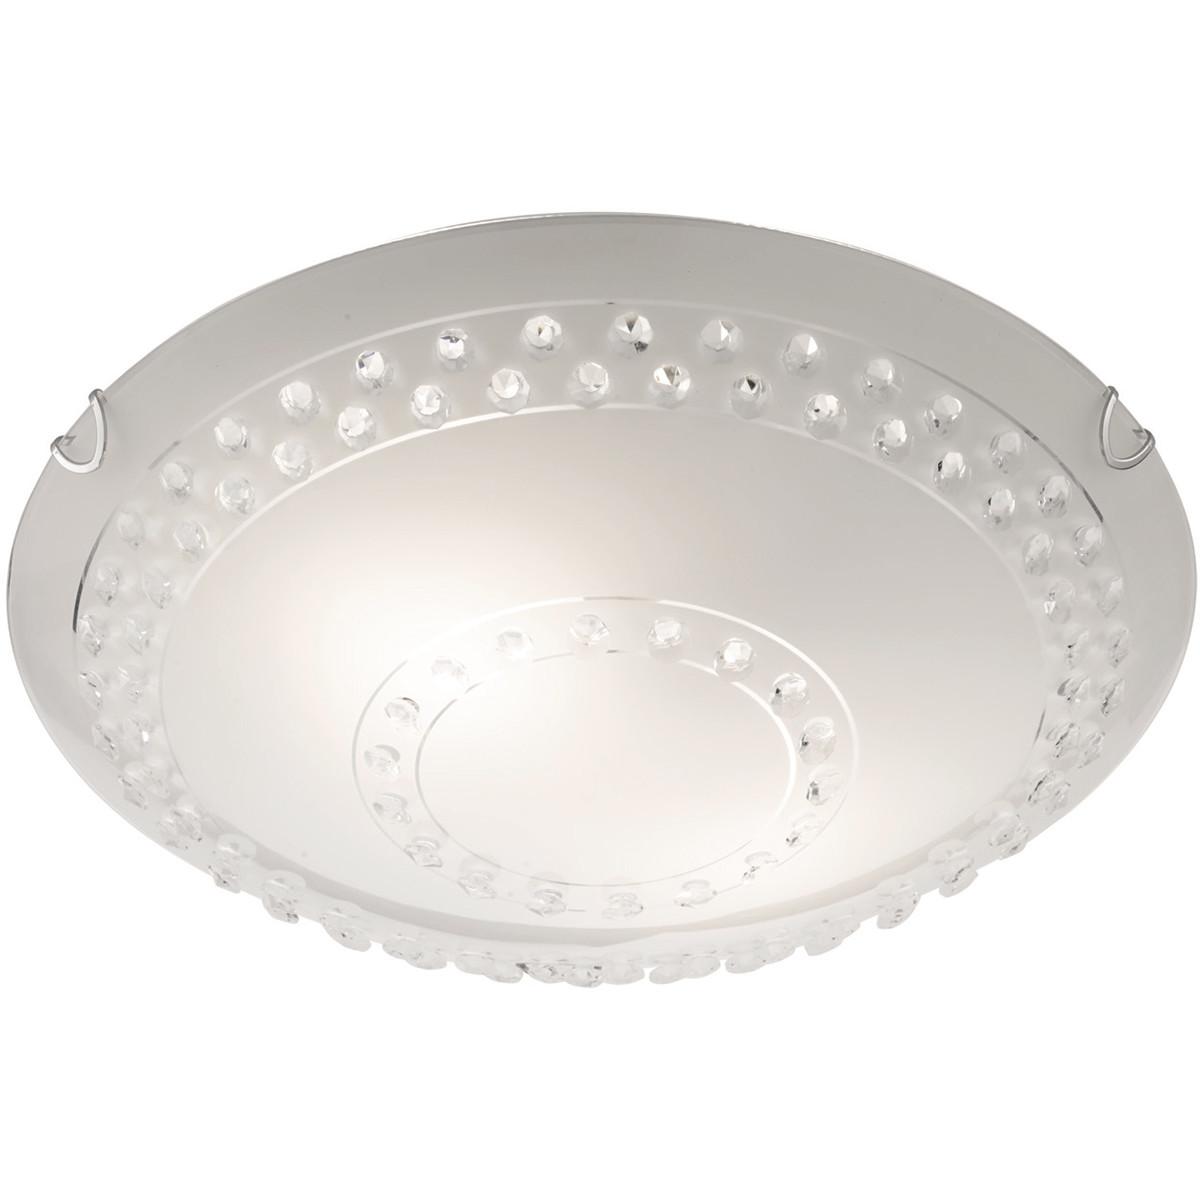 LED Plafondlamp - Plafondverlichting - Trion Crasto - E27 Fitting - 2-lichts - Rond - Mat Wit - Alum